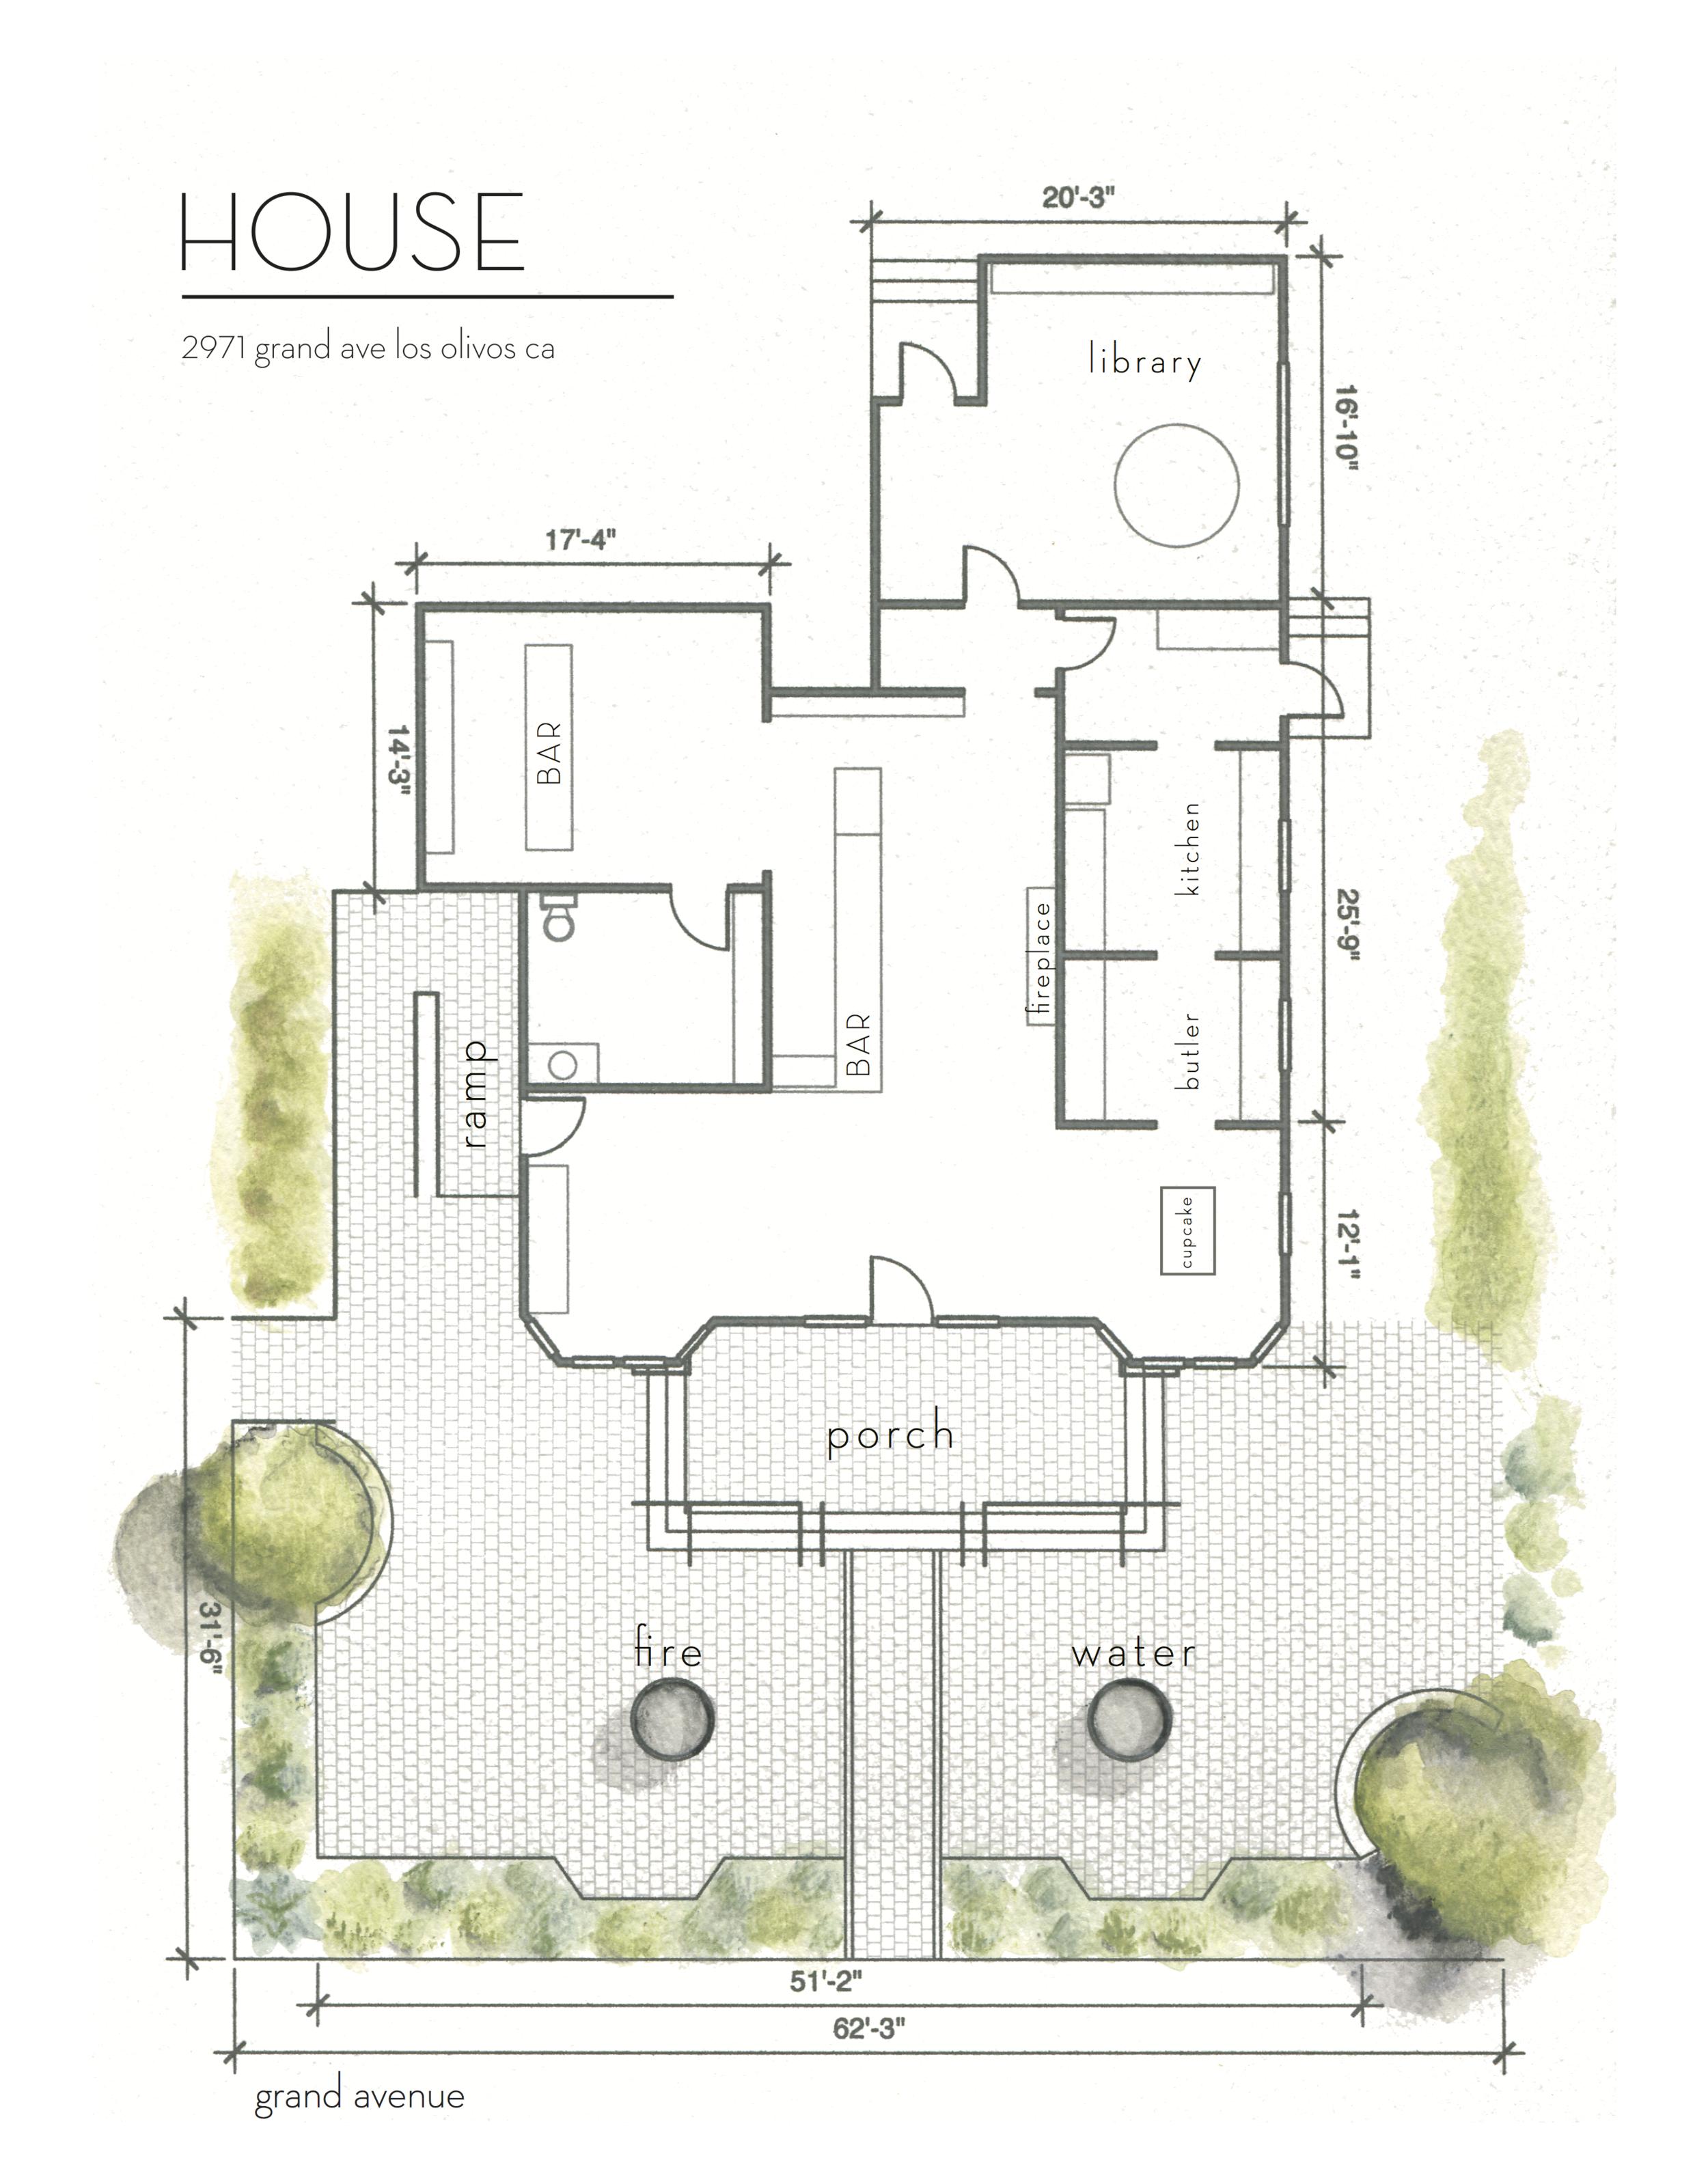 HOOUSE